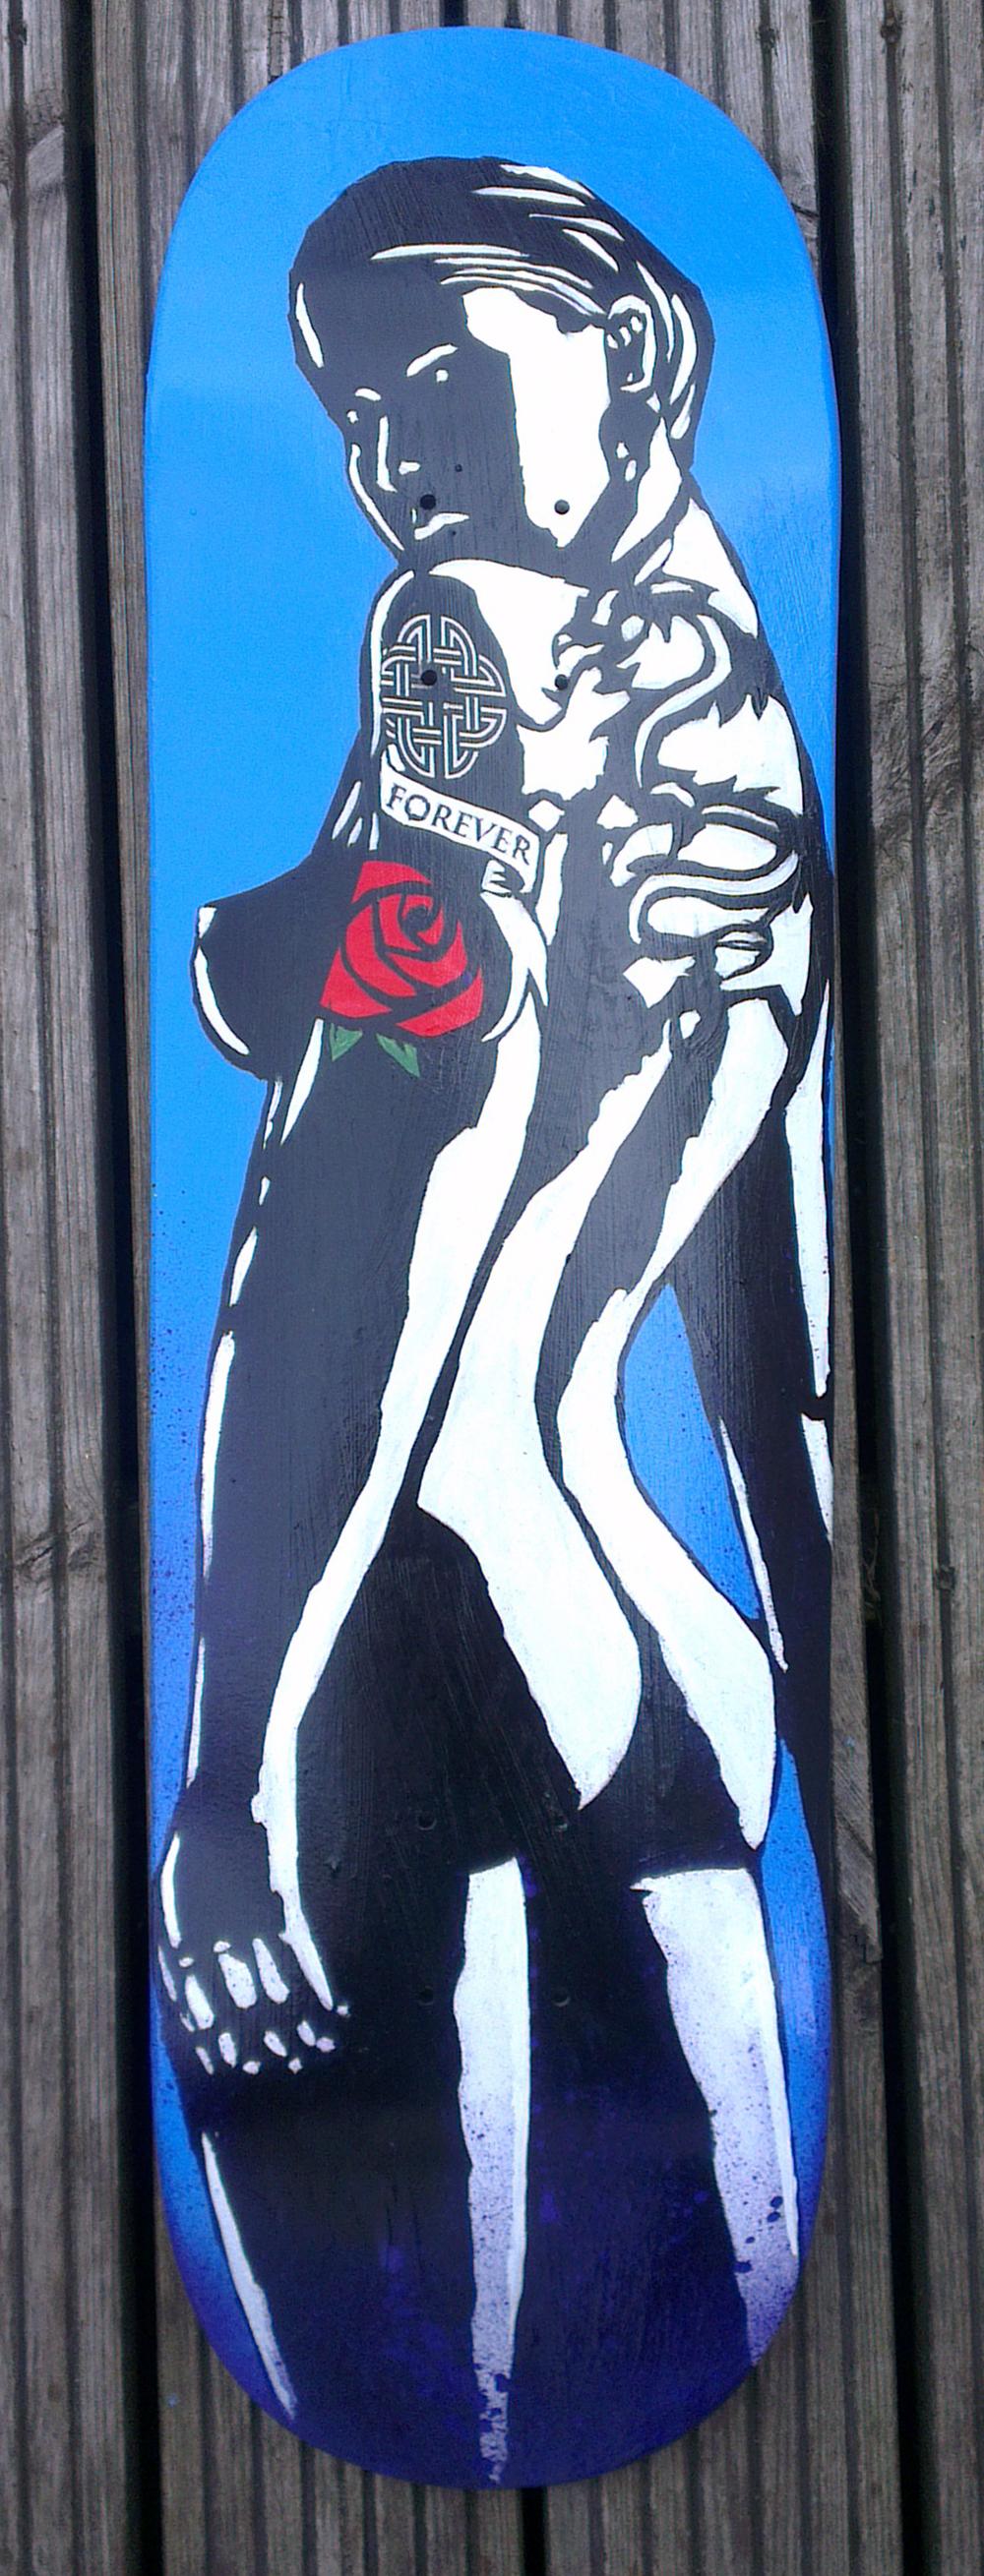 Untitled, Original painting on wooden skateboard, £300 037.jpg